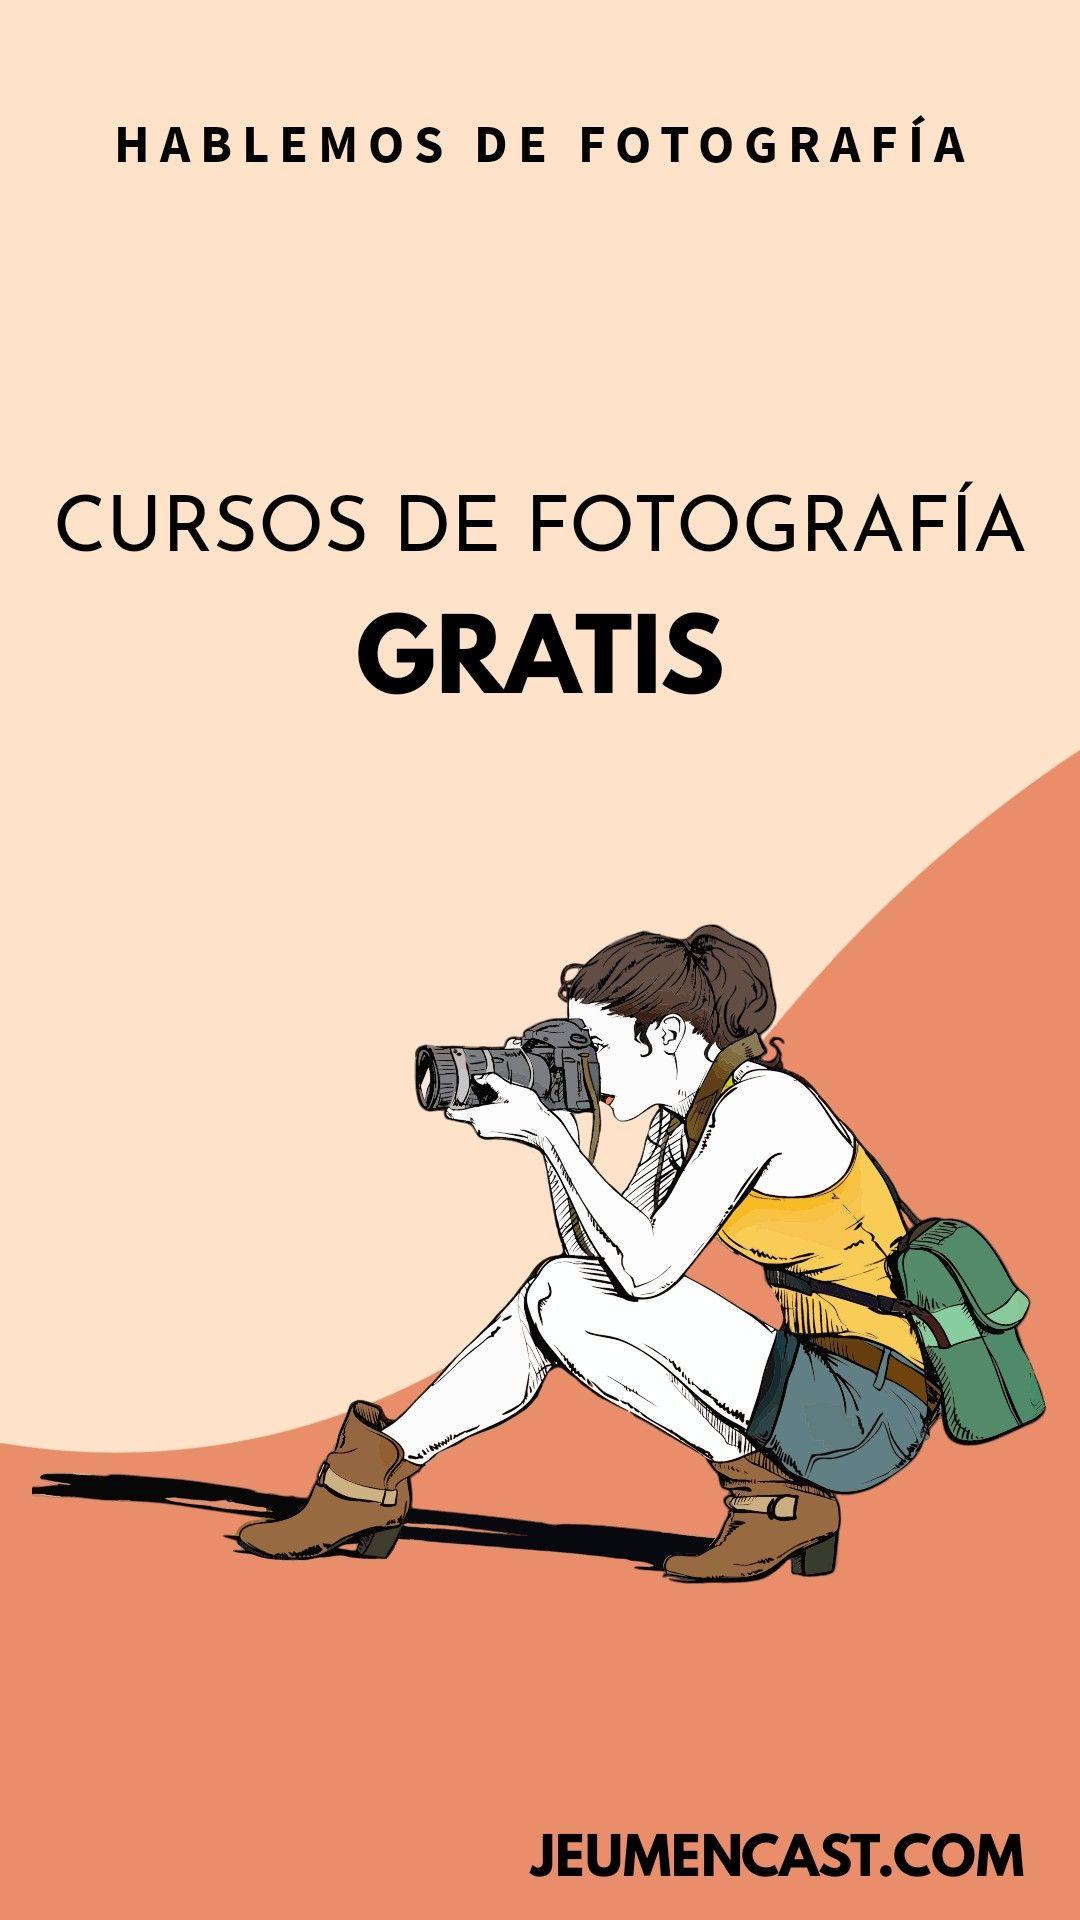 Cursos De Fotografía En 2021 Cursos De Fotografia Cursos De Fotografia Online Aprender Fotografía